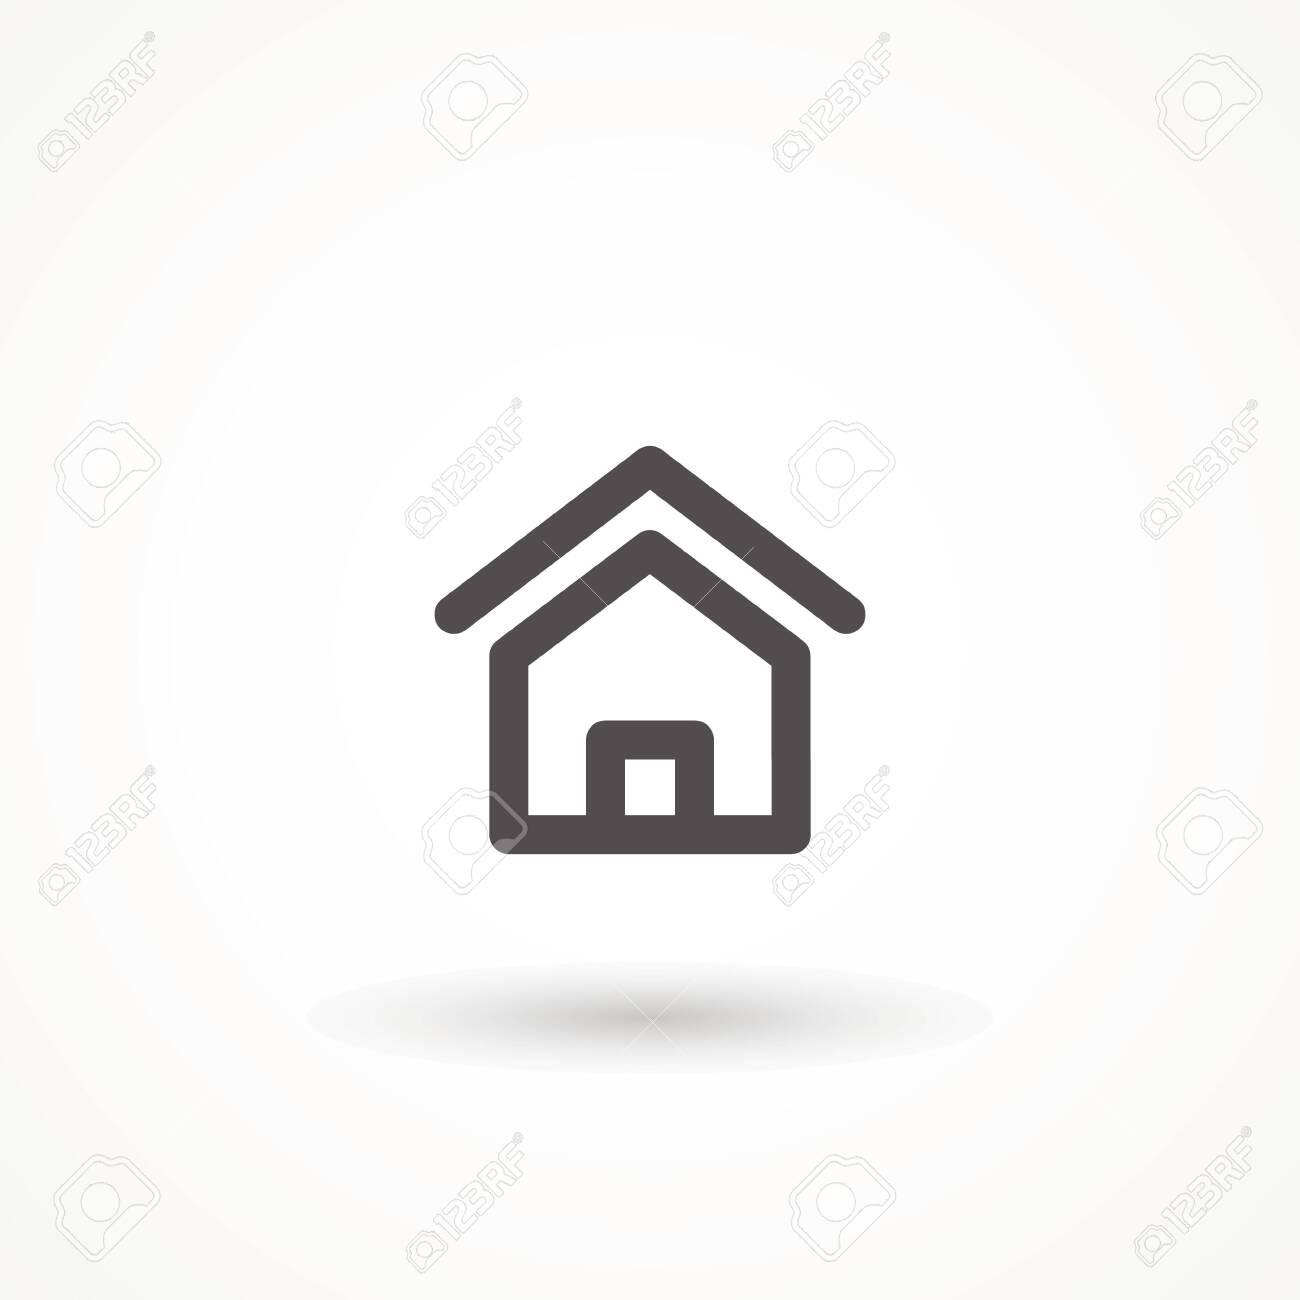 House icon with door, outline design vector Home icon Editable strok. - 140513017